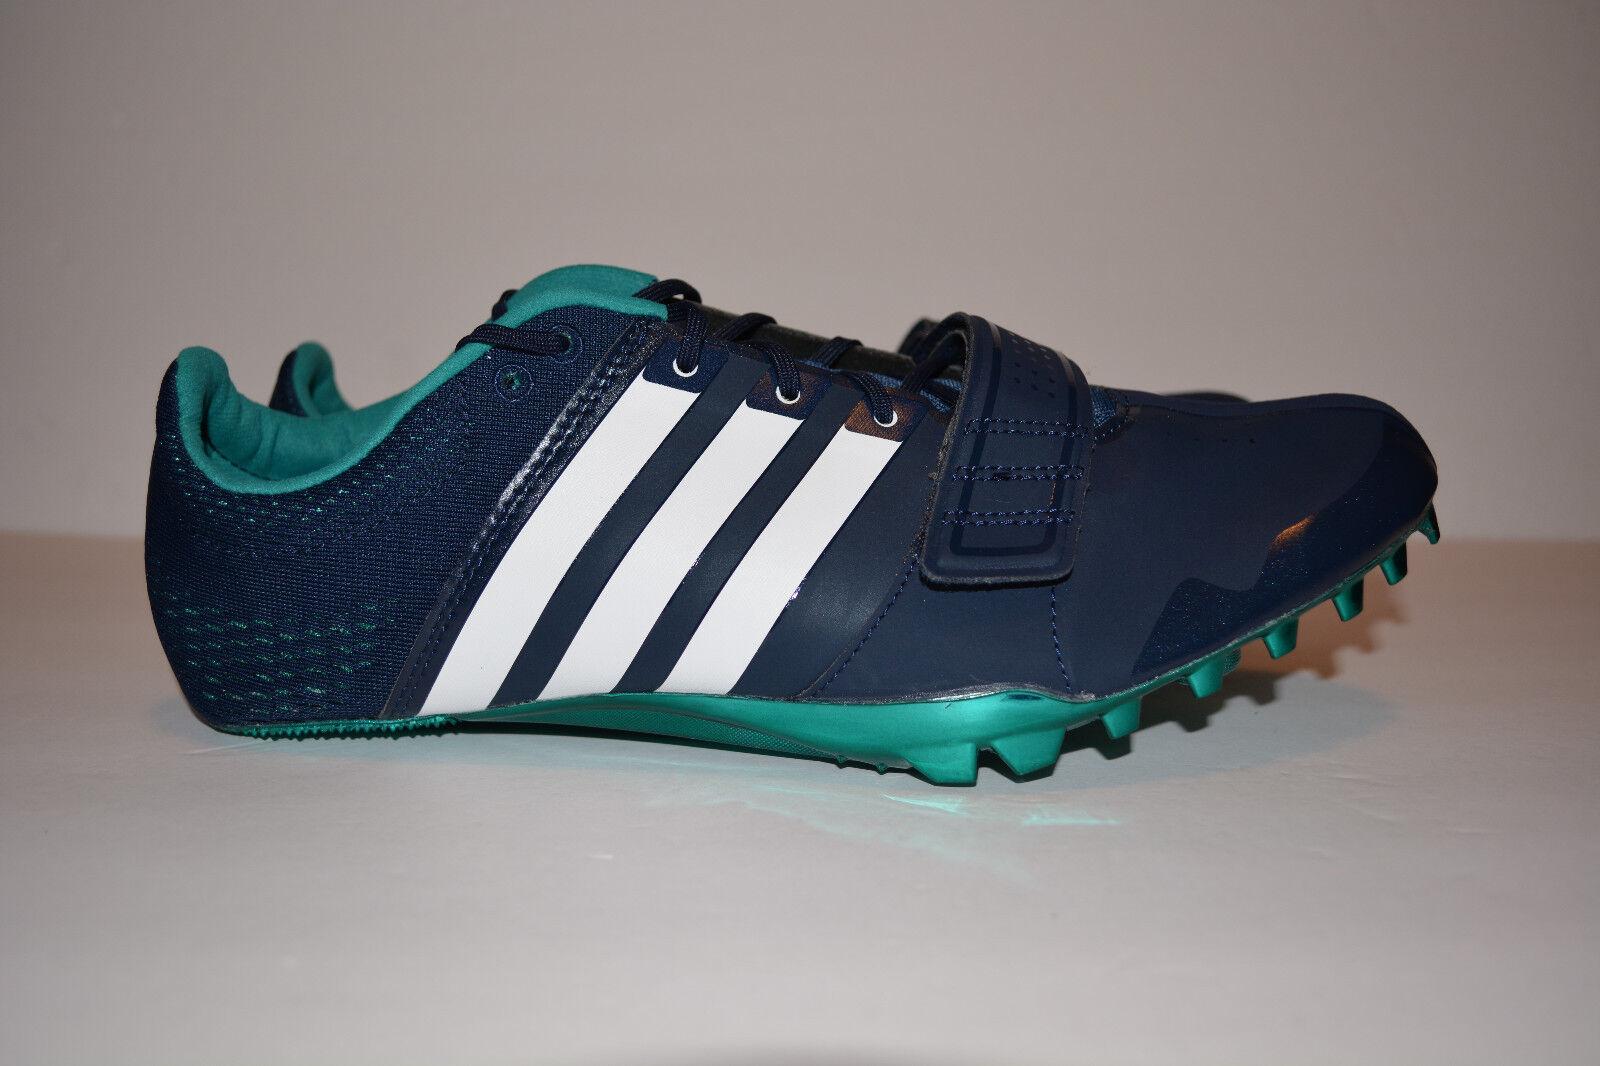 Adidas Men's Adizero Accelerator Spikes Collegiate Navy White Size 11 S78629